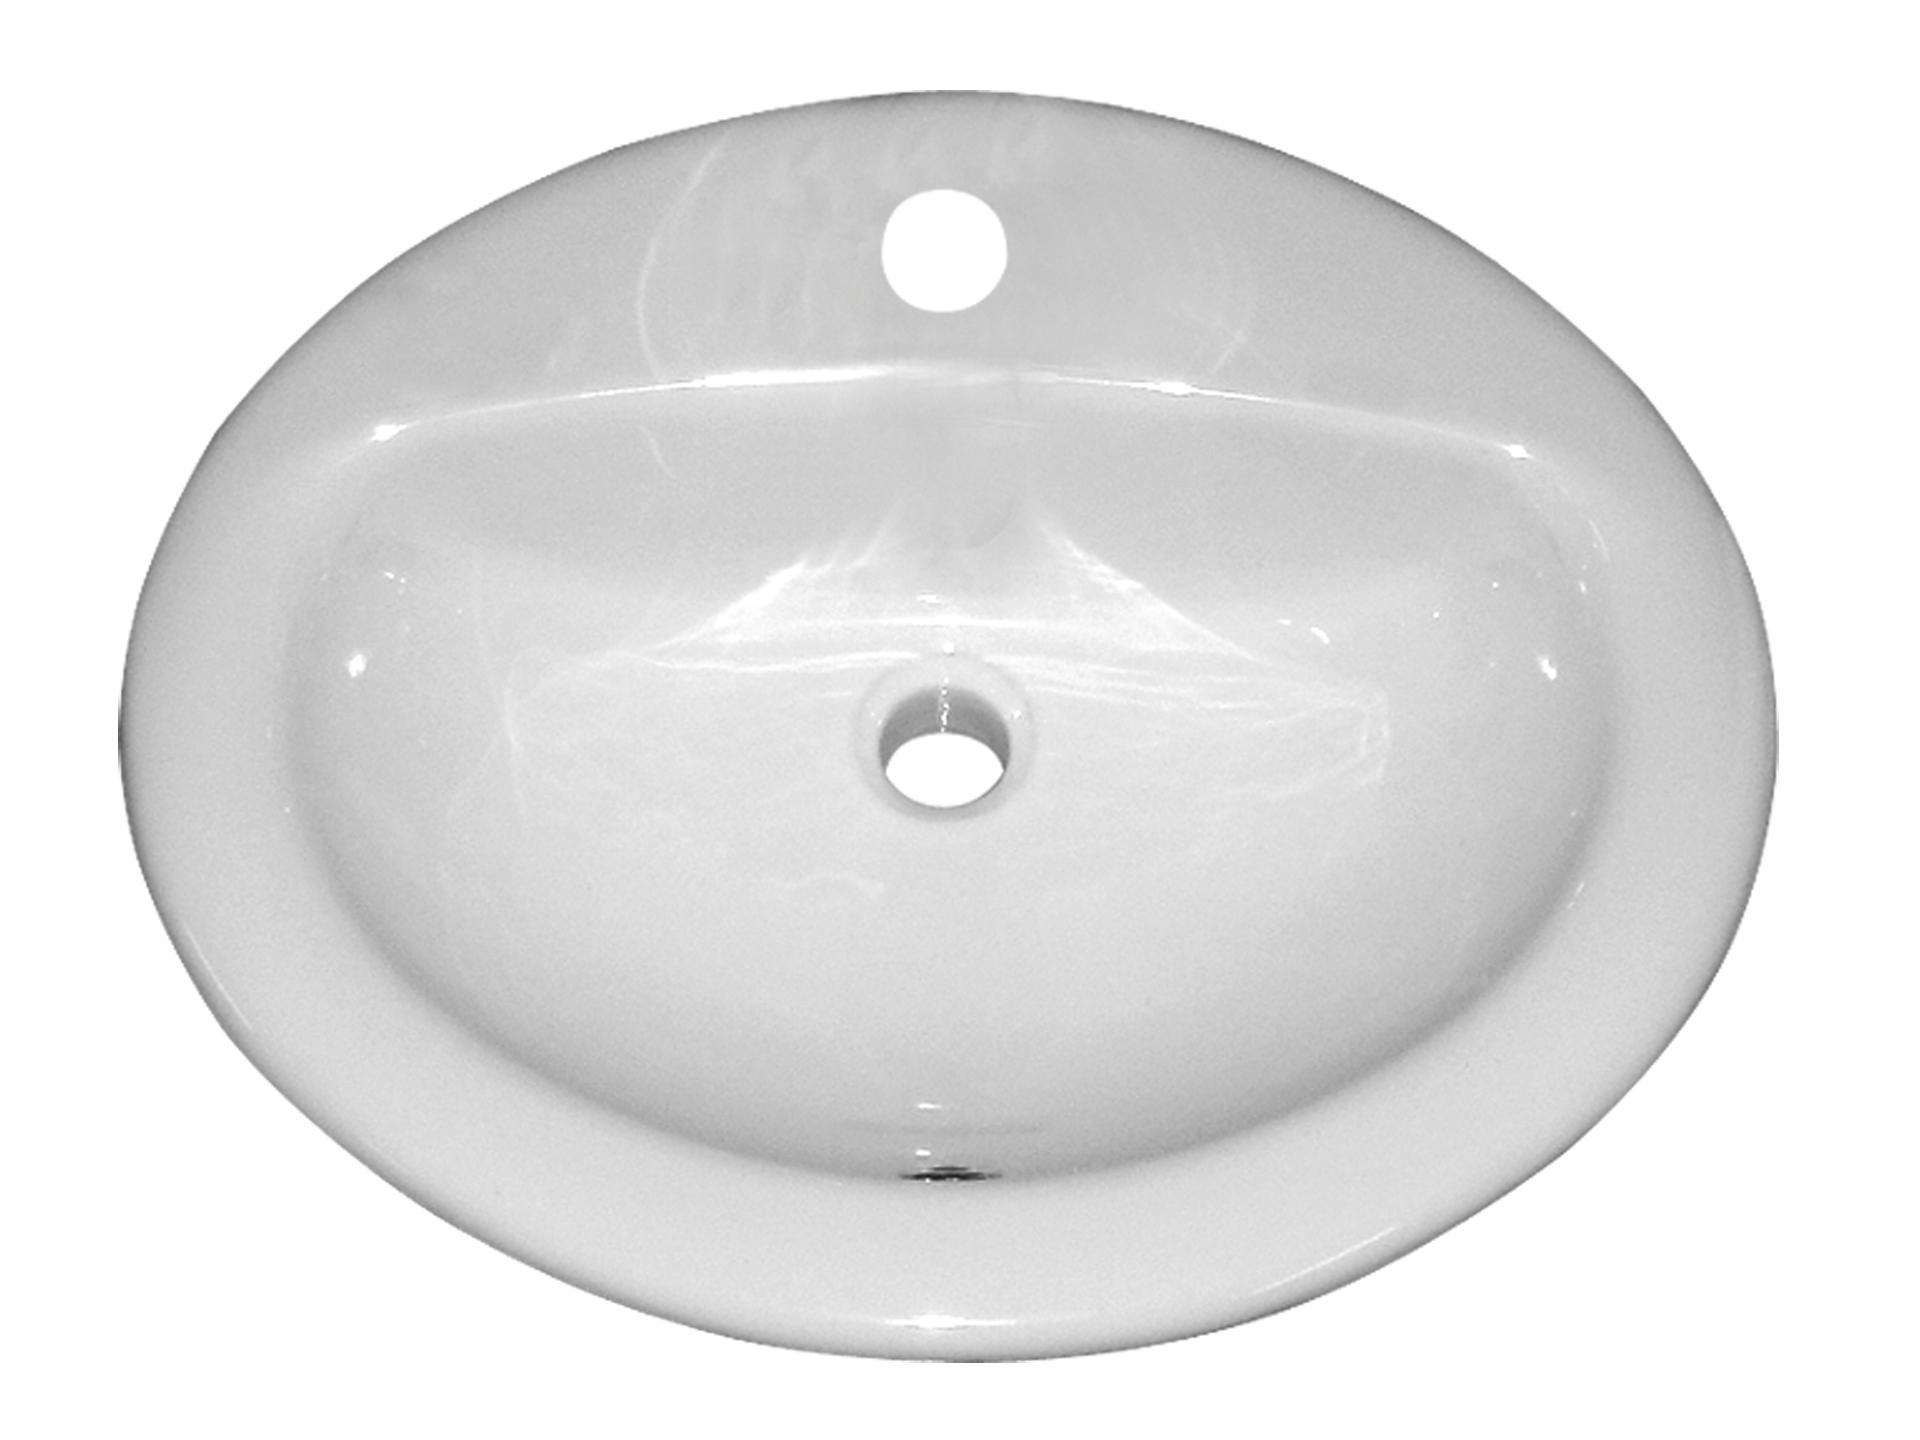 Mooi wasbak badkamer inbouw badkamermeubels ontwerpen 2017